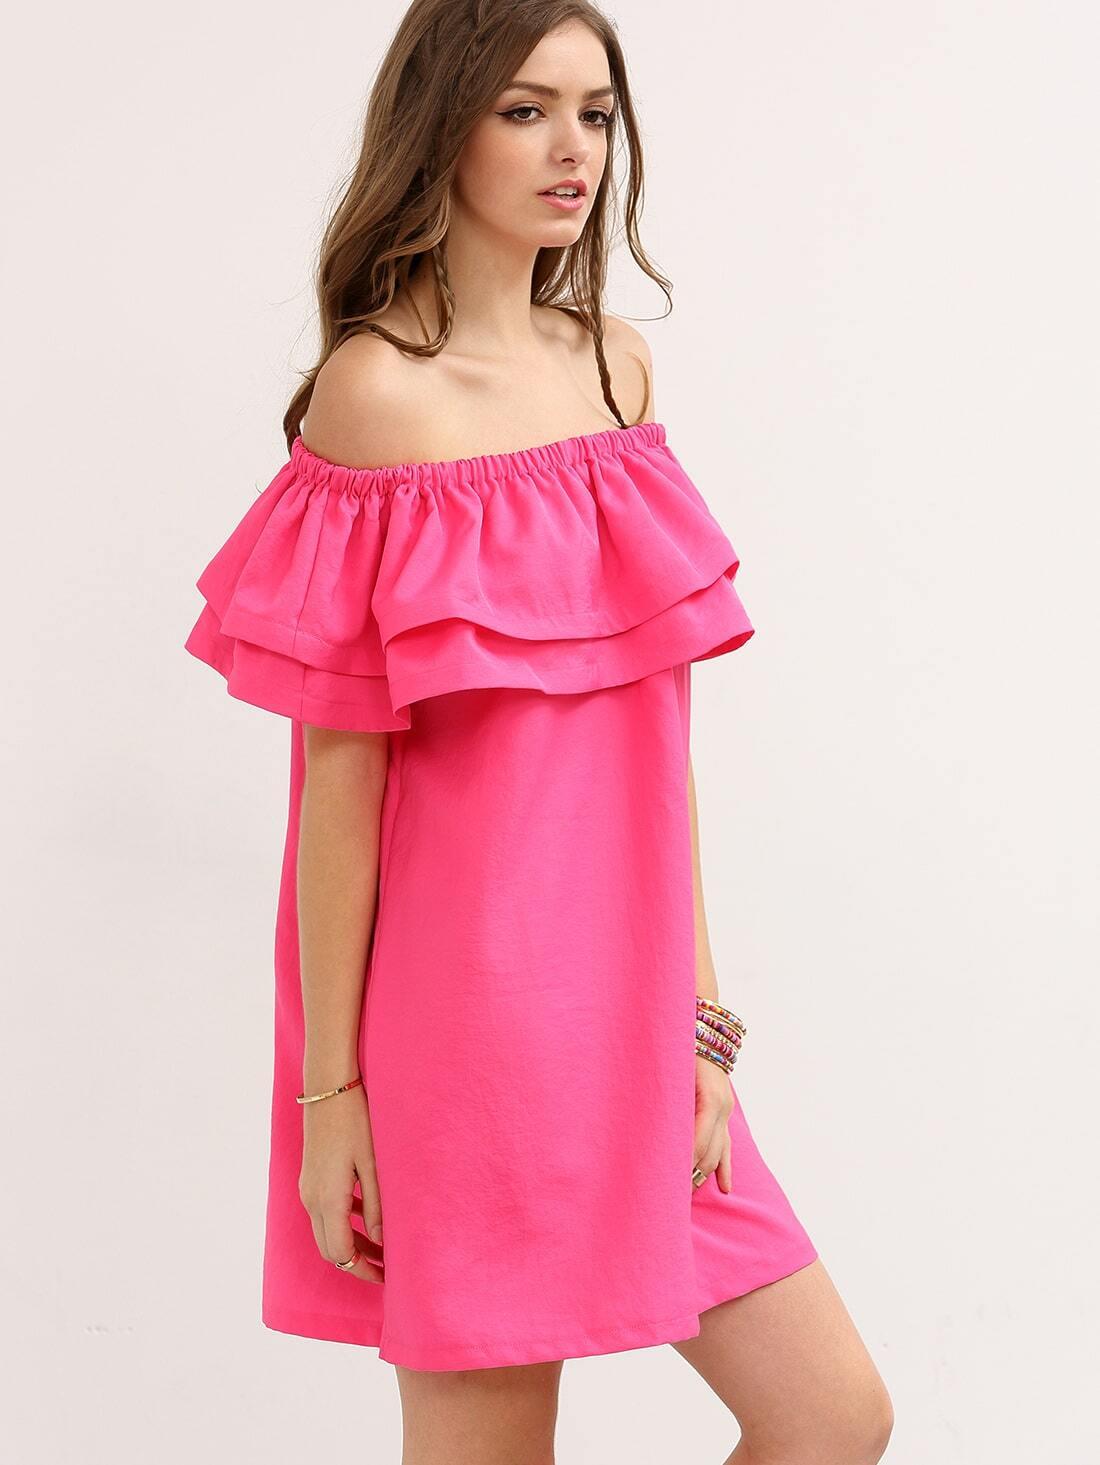 Hot Pink Off The Shoulder Ruffle Shift Dress EmmaCloth-Women Fast Fashion Online